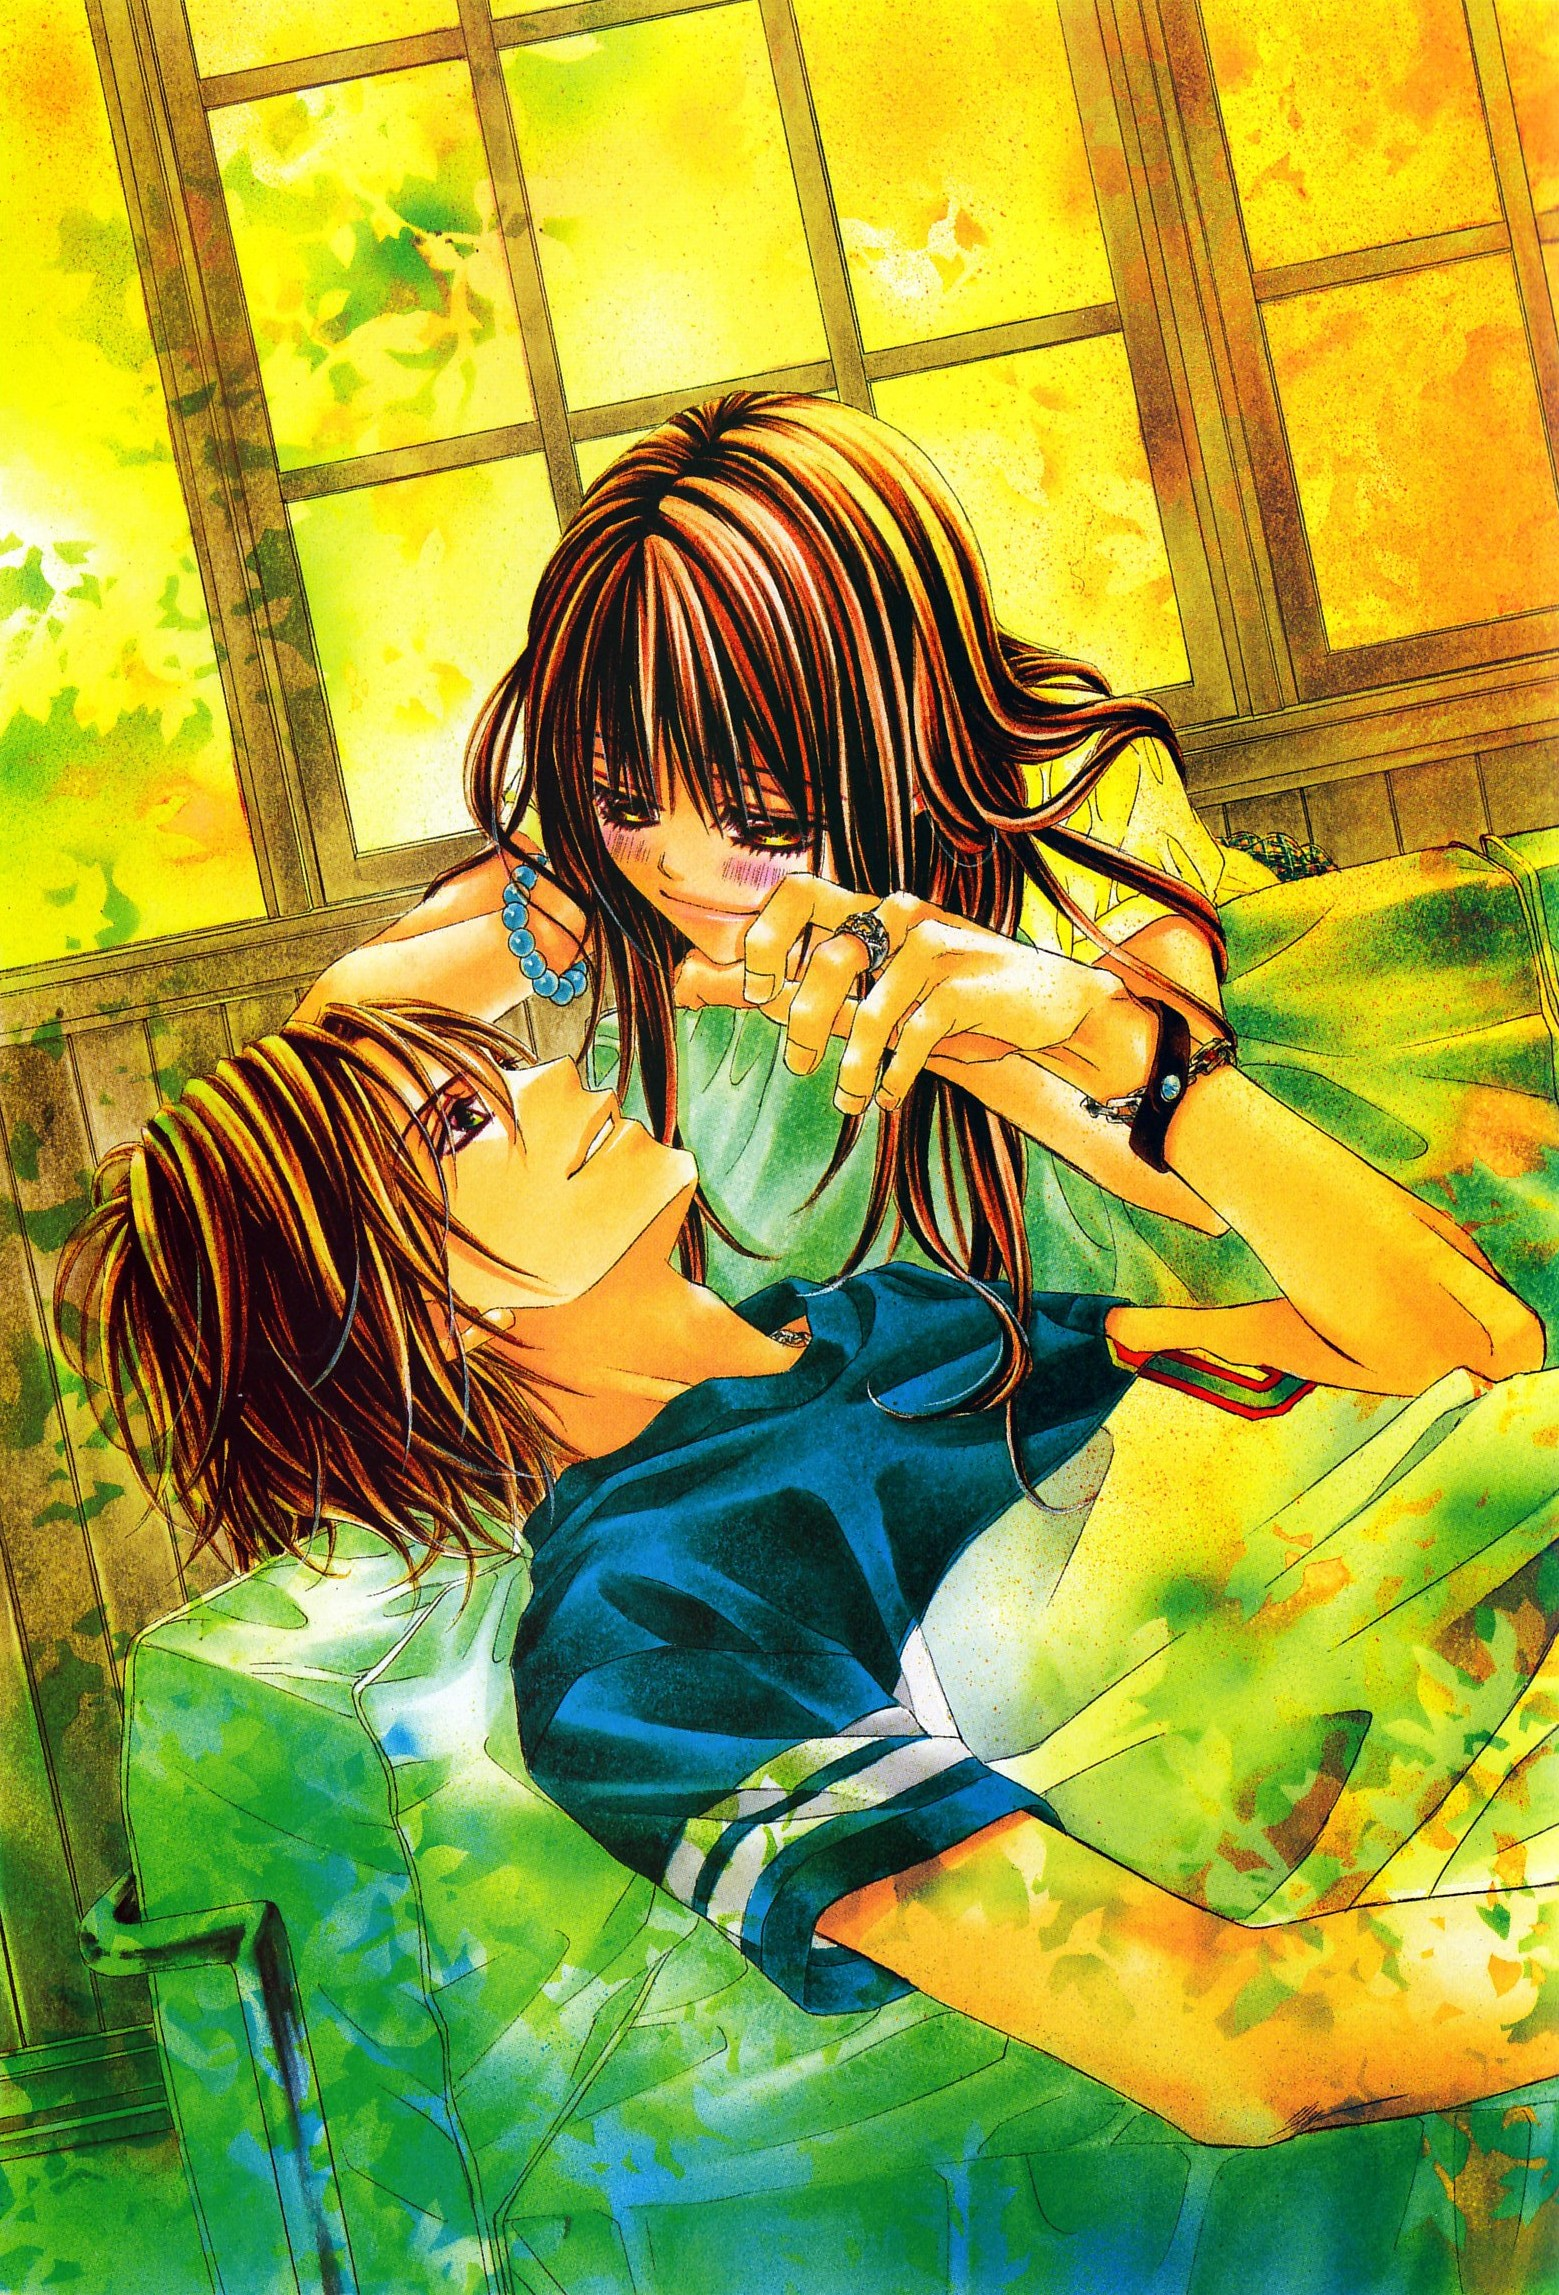 Kyou Koi wo Hajimemasu (Today We'Ll Start Our Love ...